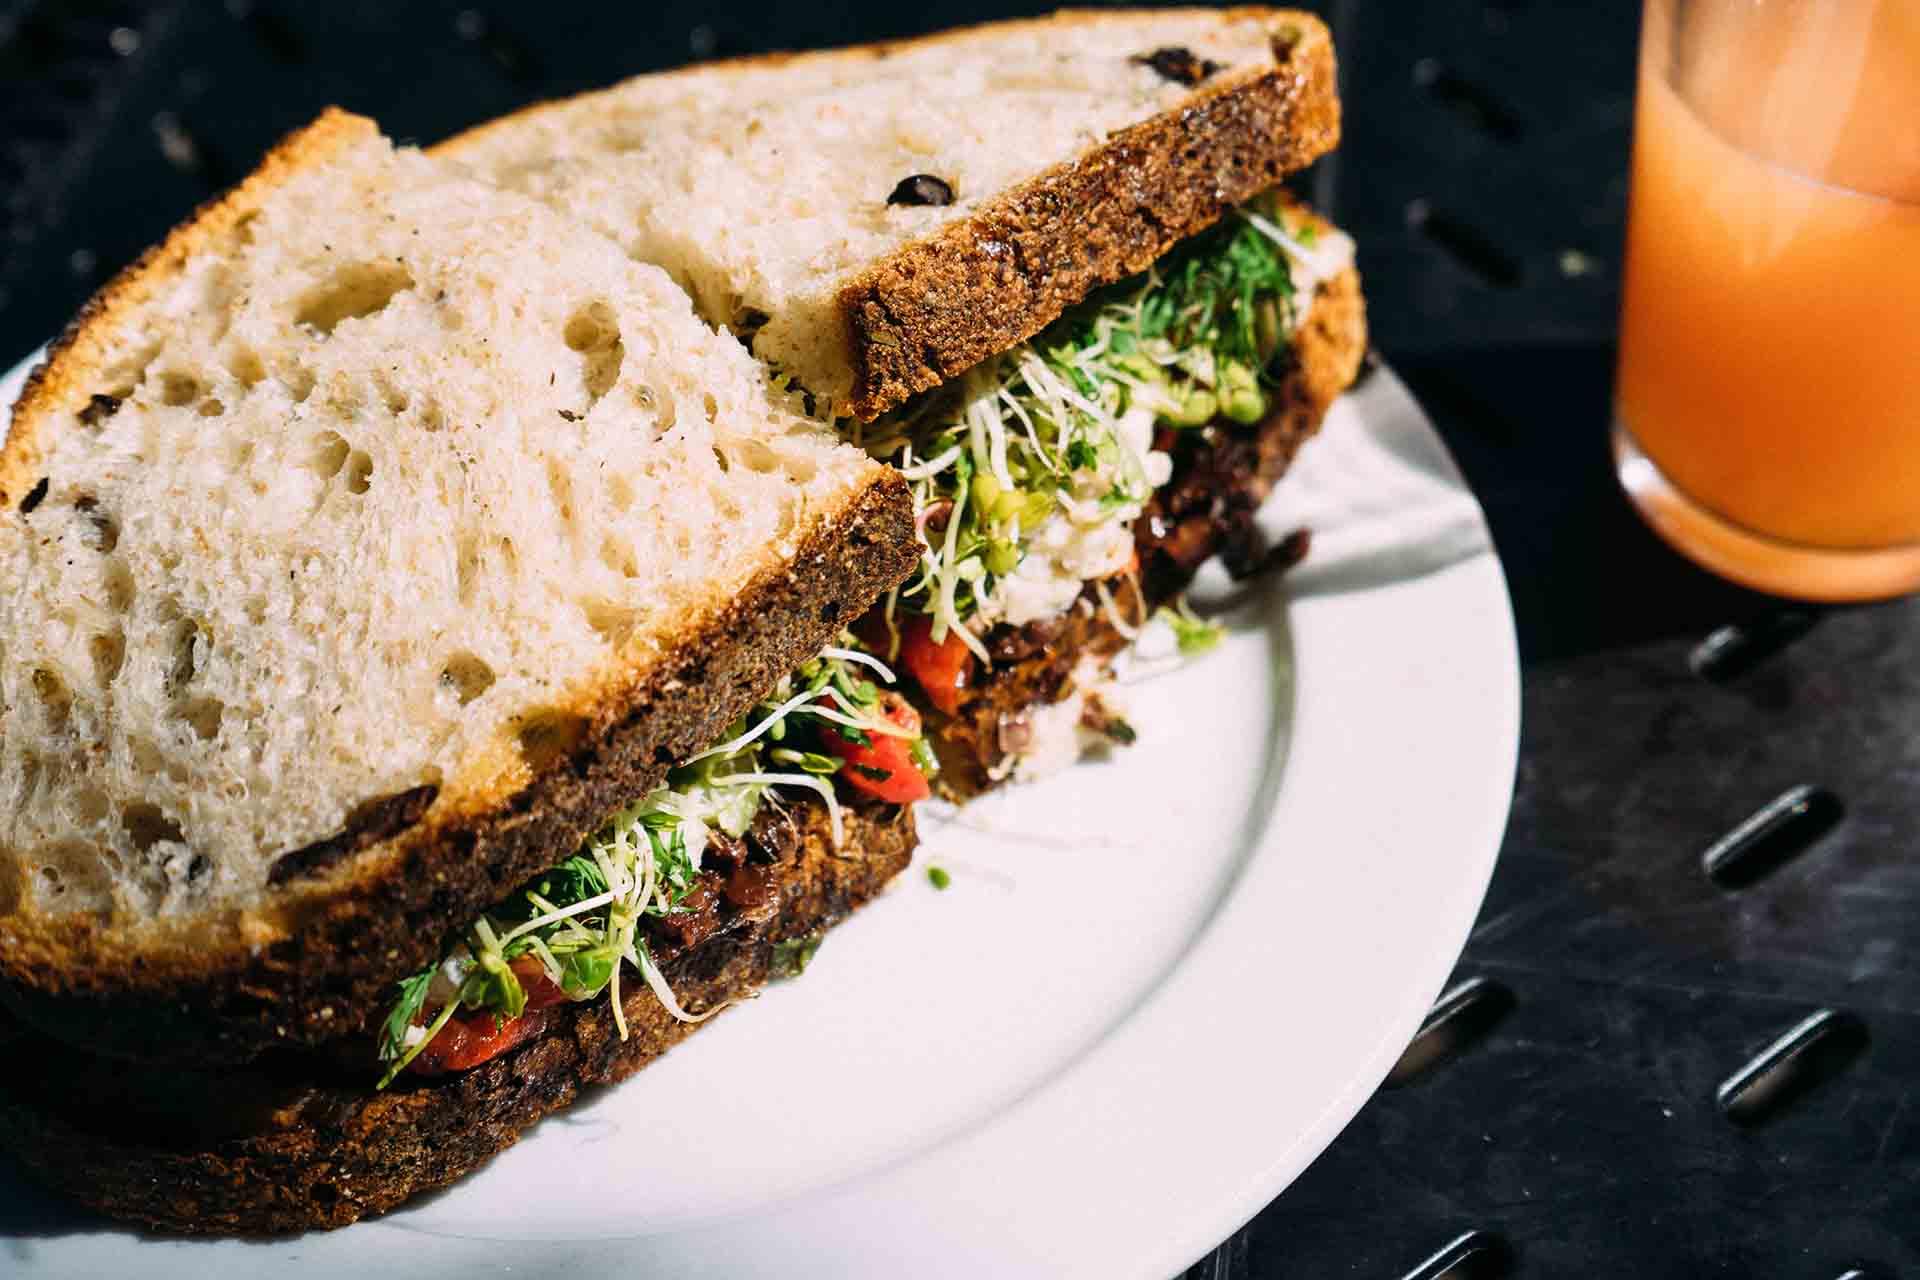 bread-food-salad-sandwich